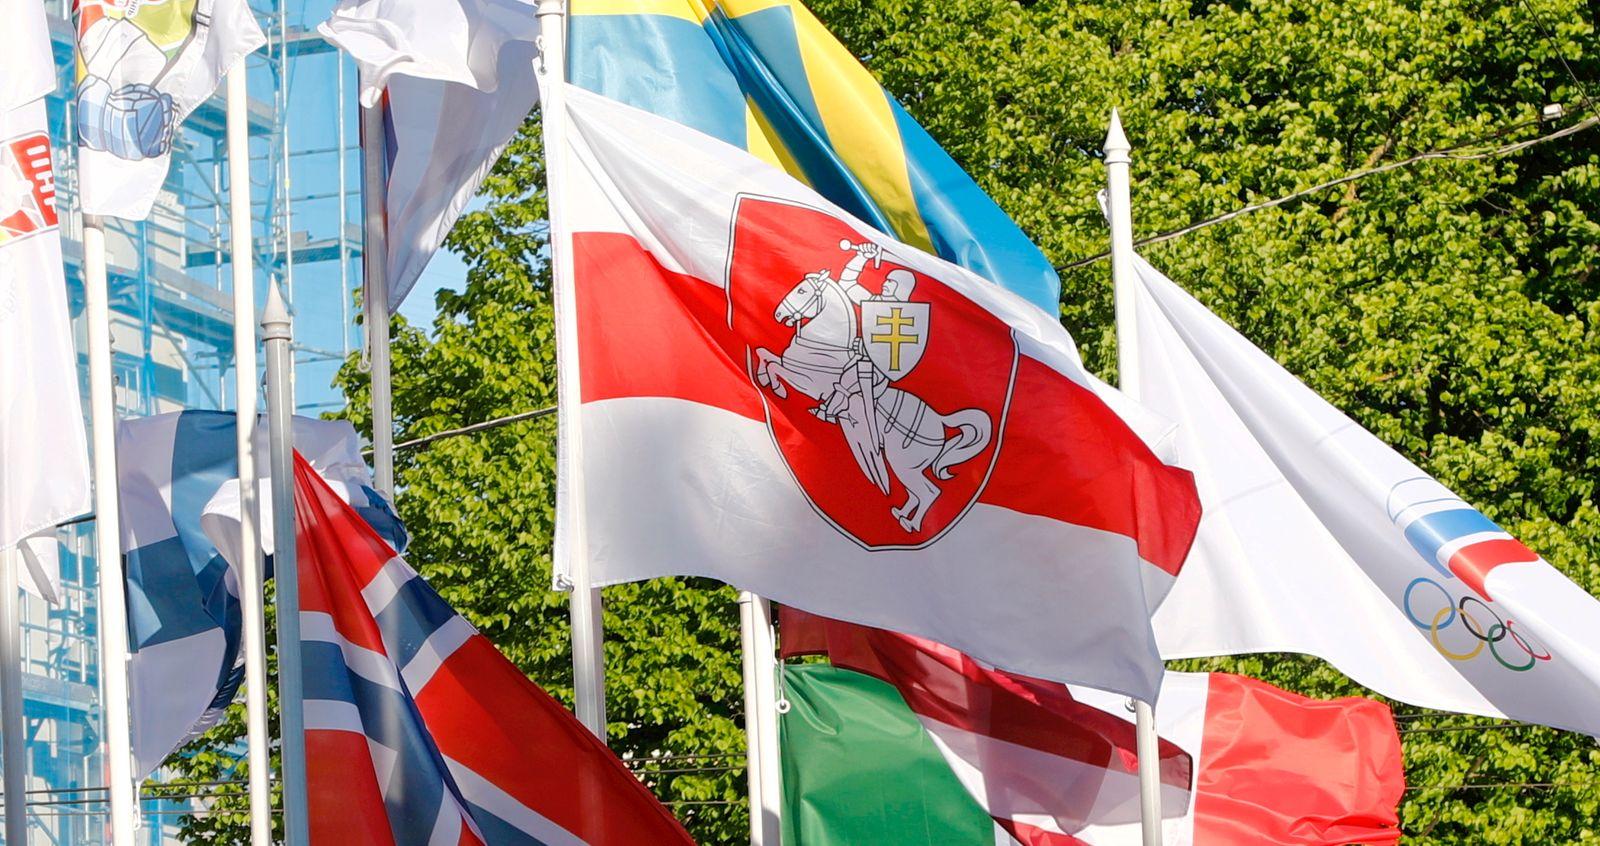 Belarusian opposition flag at IIHF World Ice Hockey Championships in Riga